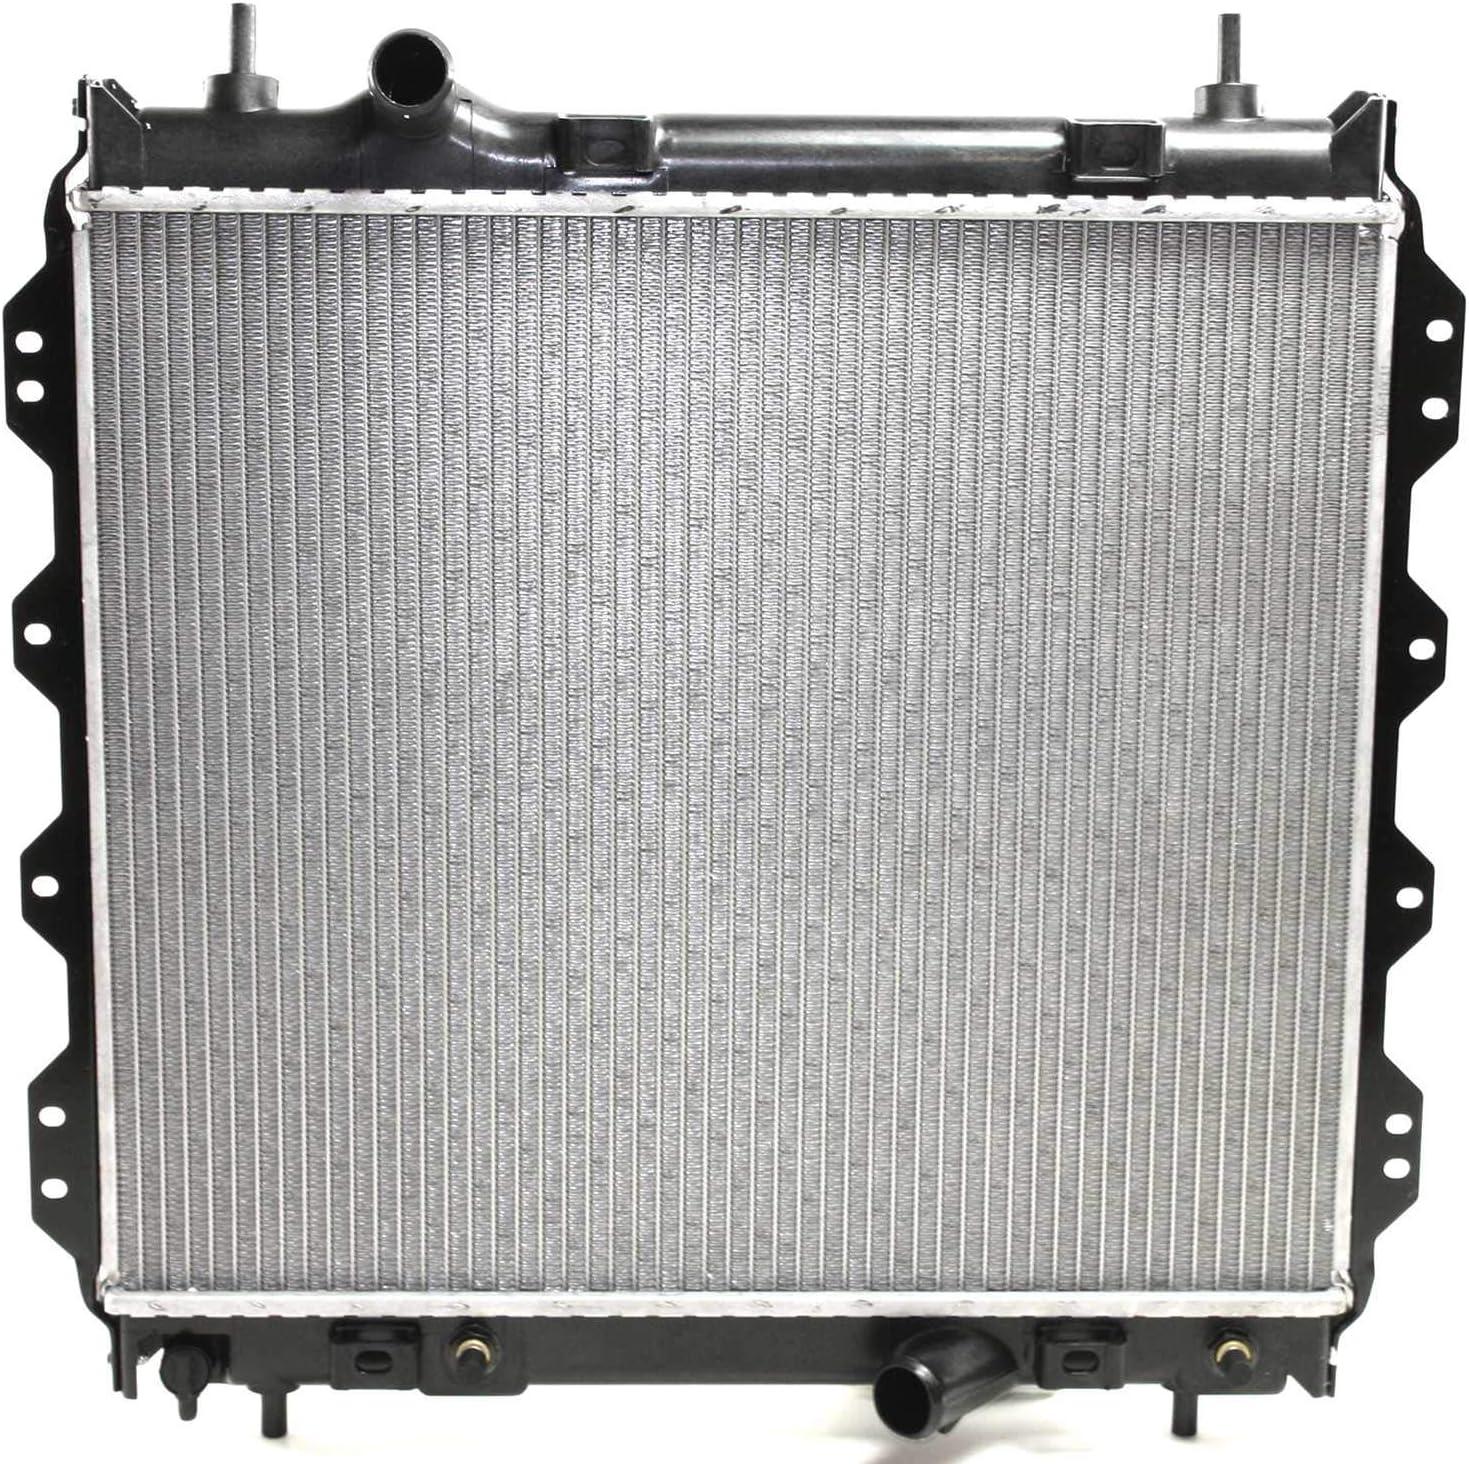 Garage-Pro Engine Splash Shield for ACURA TSX 2010-2014 Under Cover 3.5L Eng Sedan